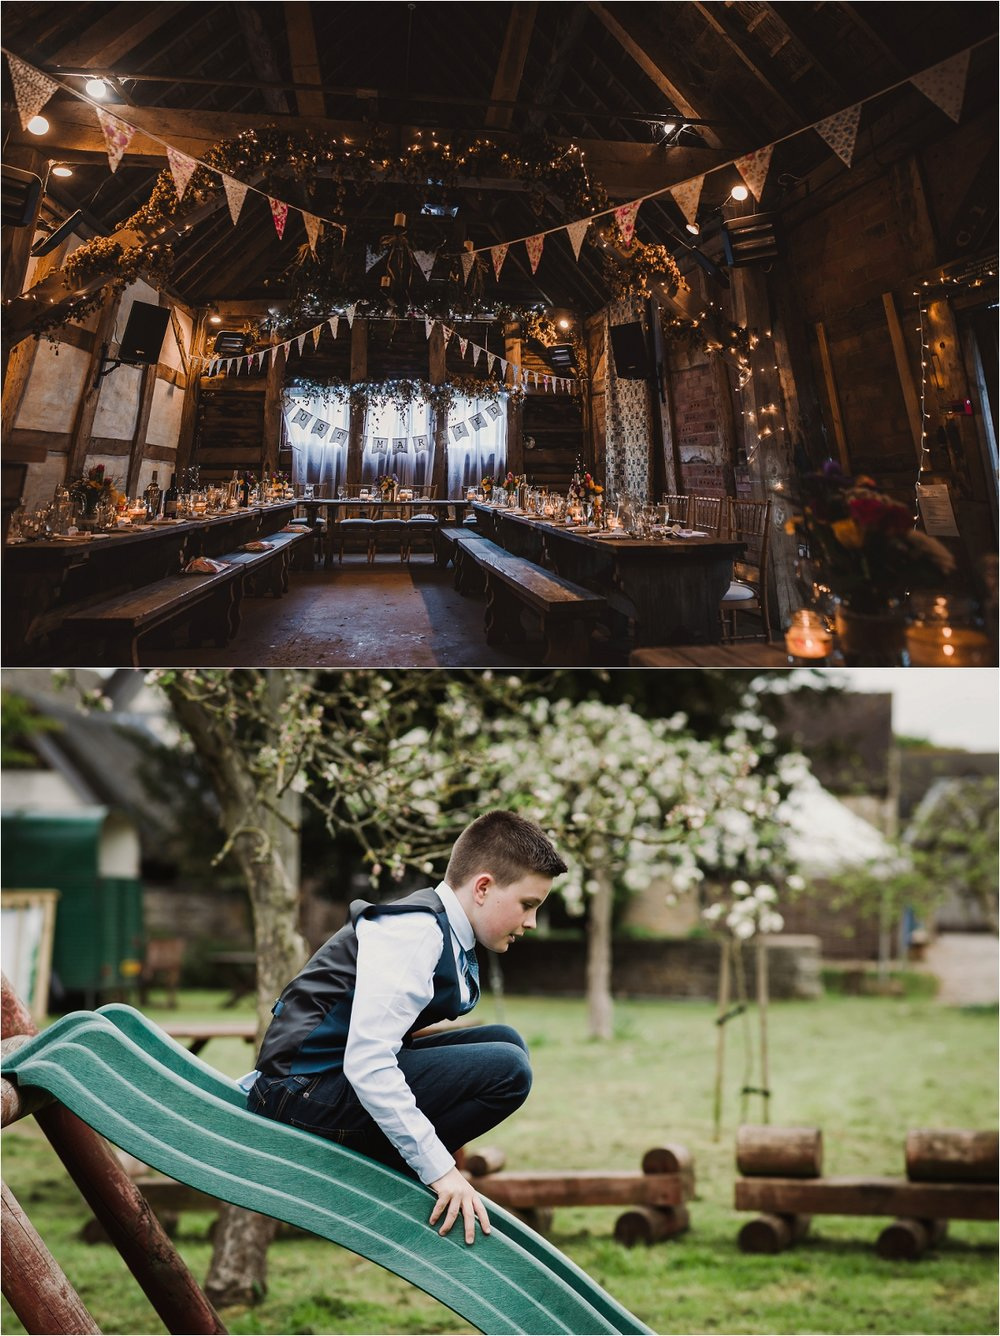 chris_emma_wedding_the_Fleece_inn_0050.jpg